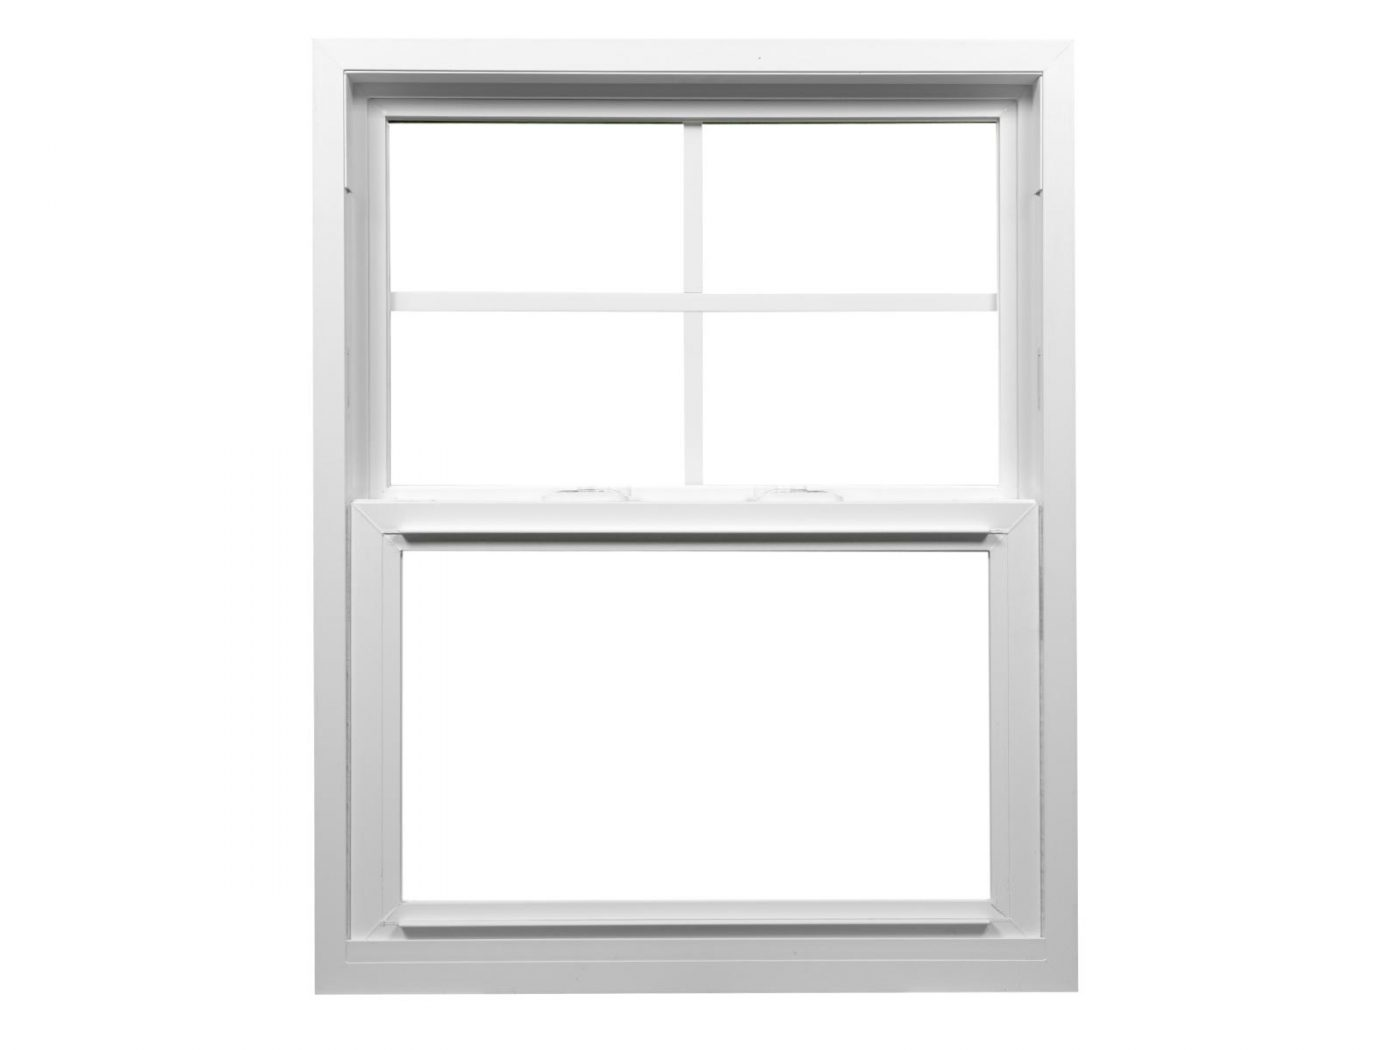 seattle Signature series single hung window installation sales